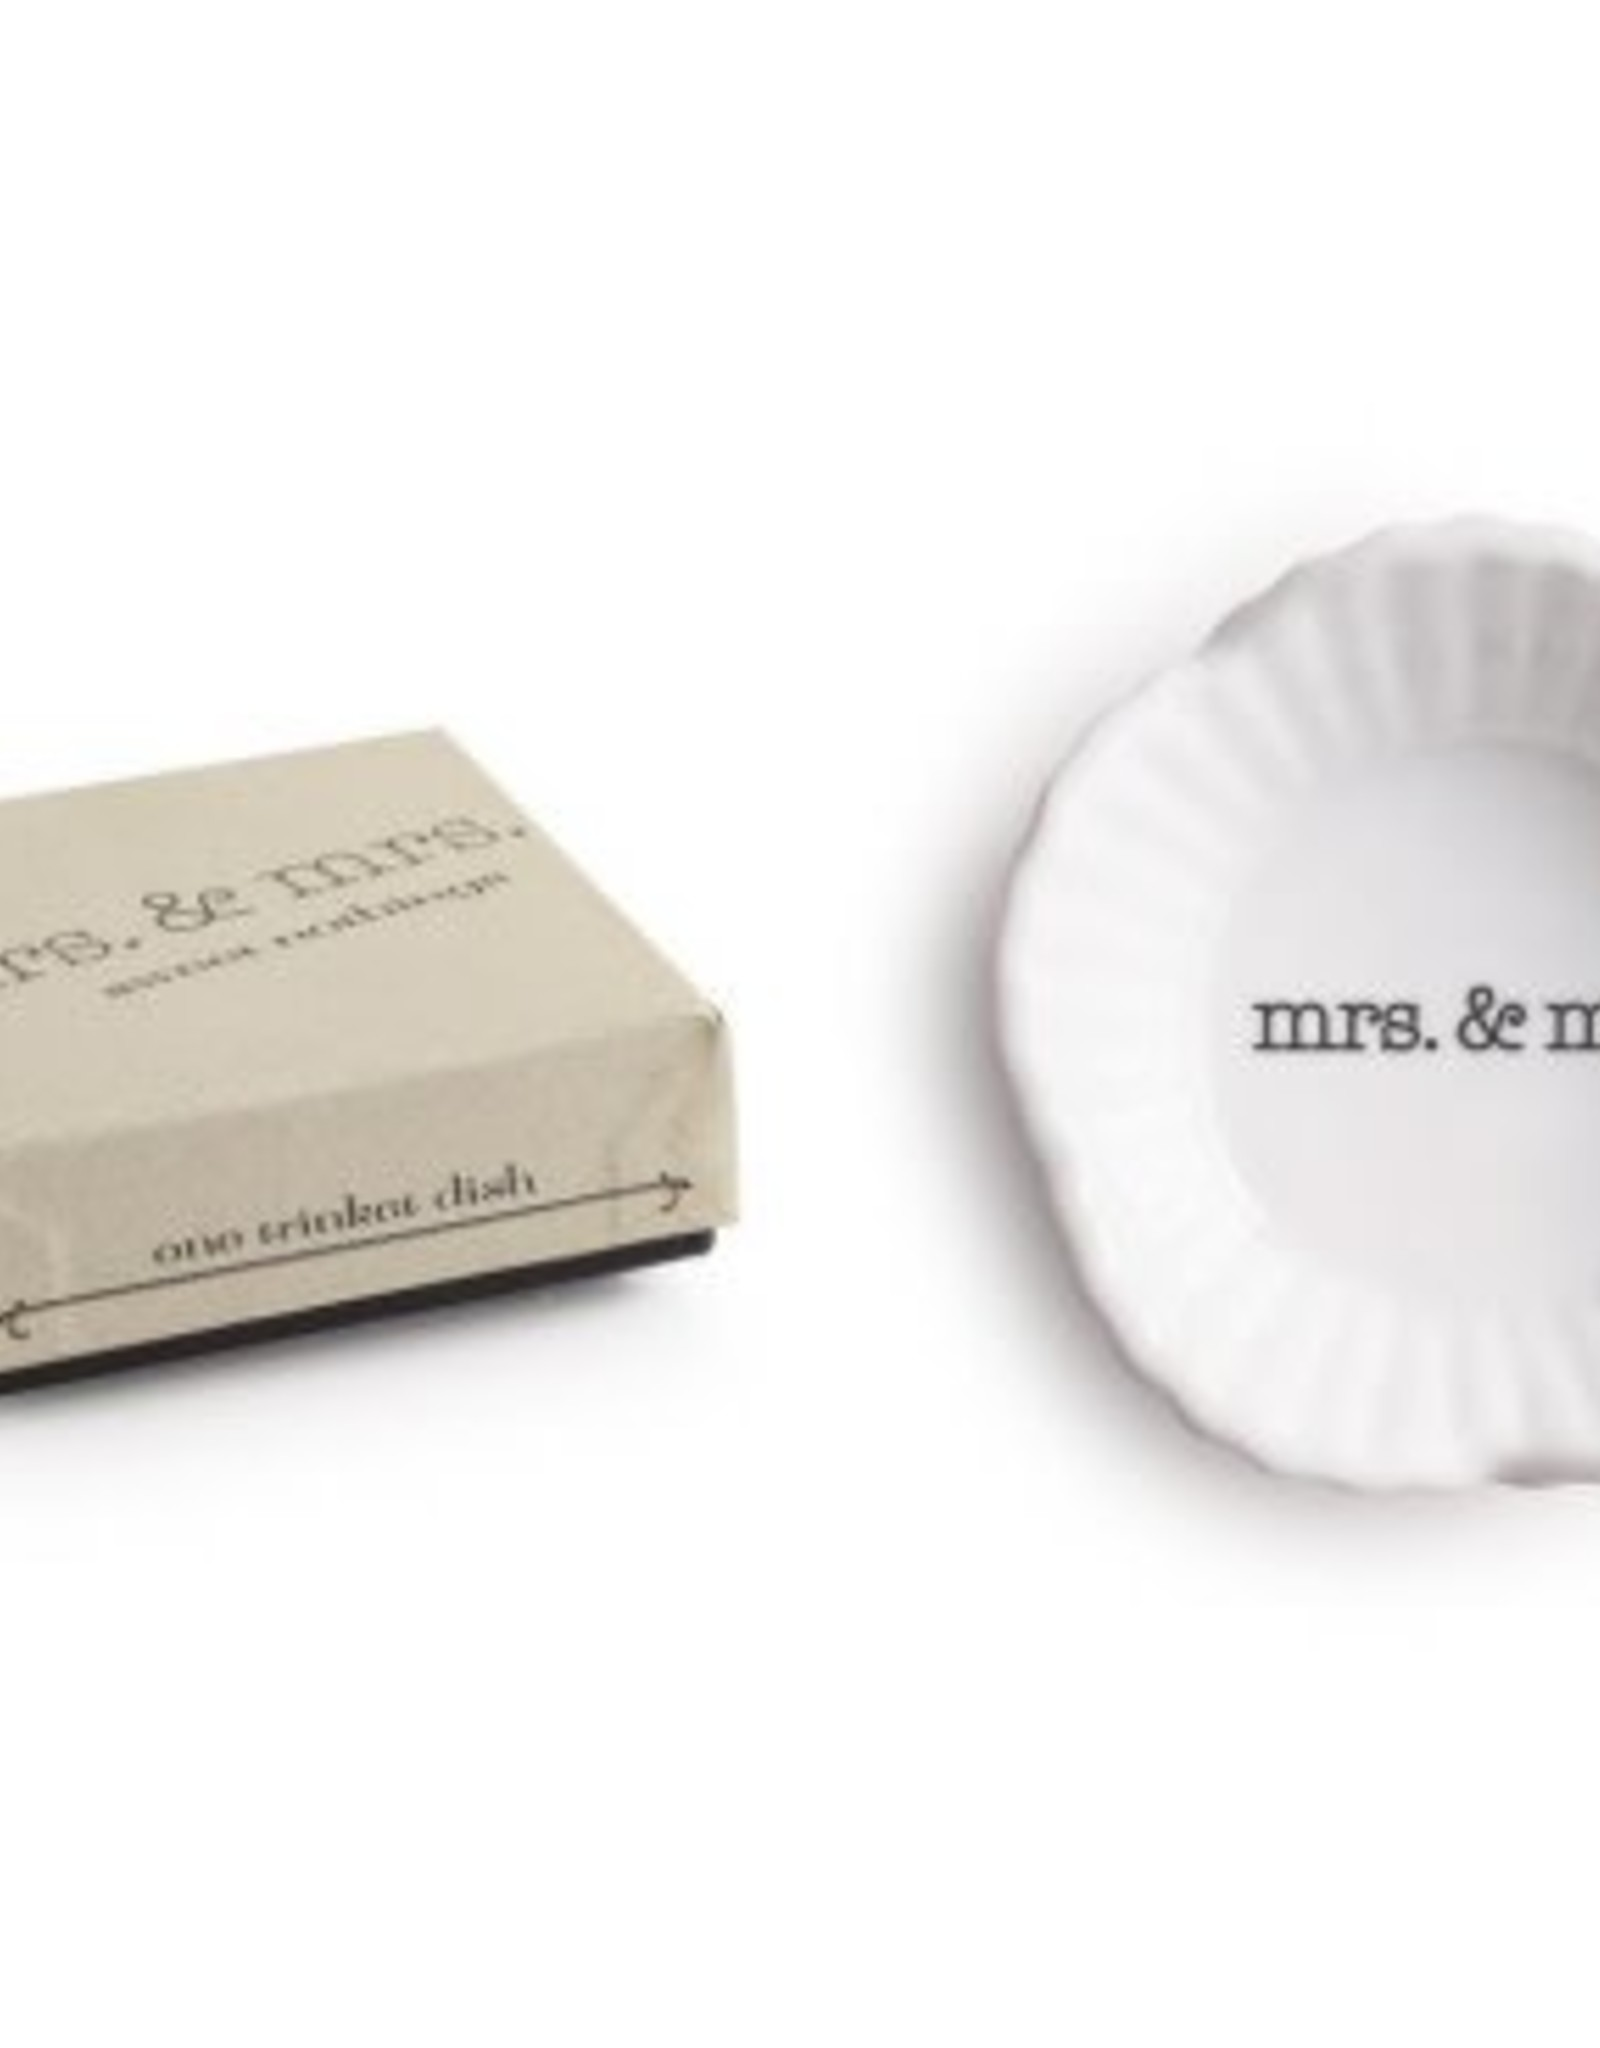 Wedding Trinket Dish